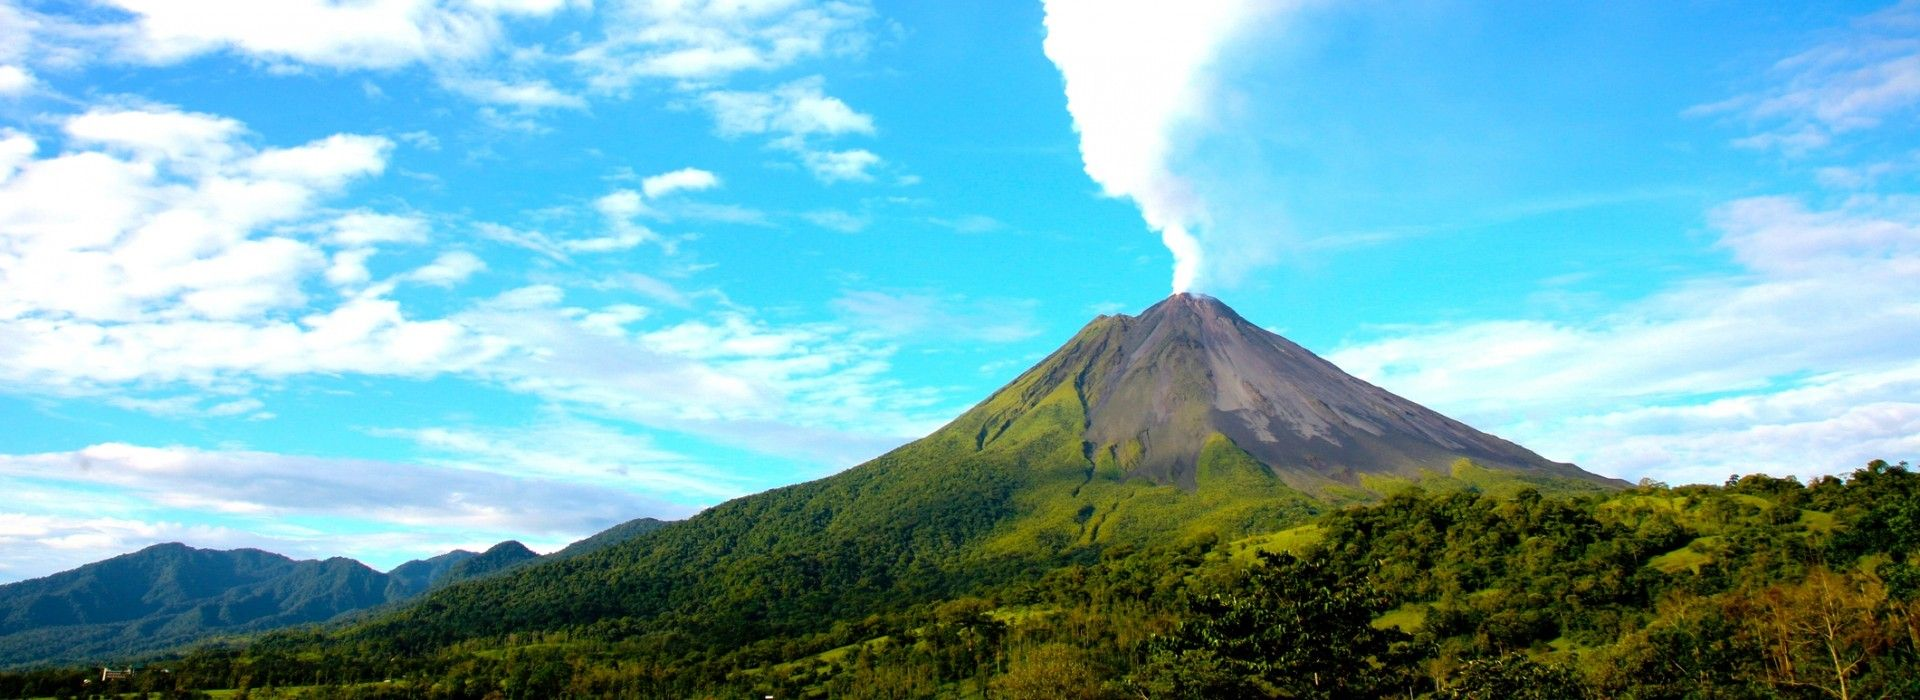 Eco tours in Costa Rica